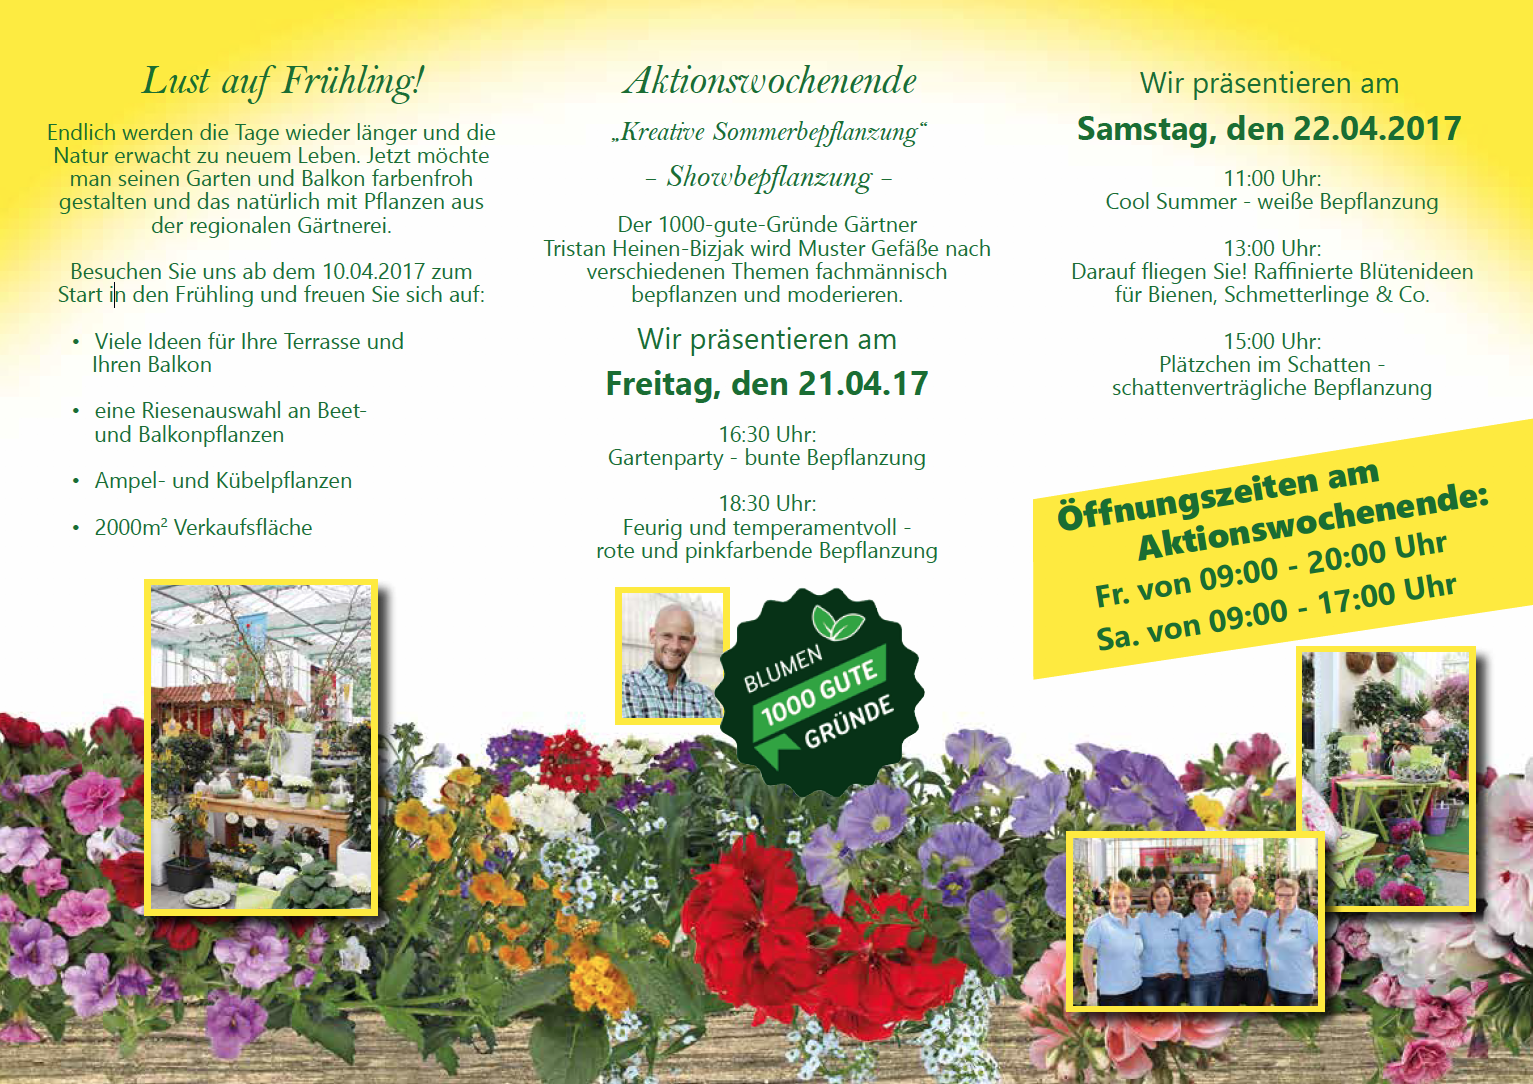 Gartenbau Welzel Beet- und Balkonsaison 2017